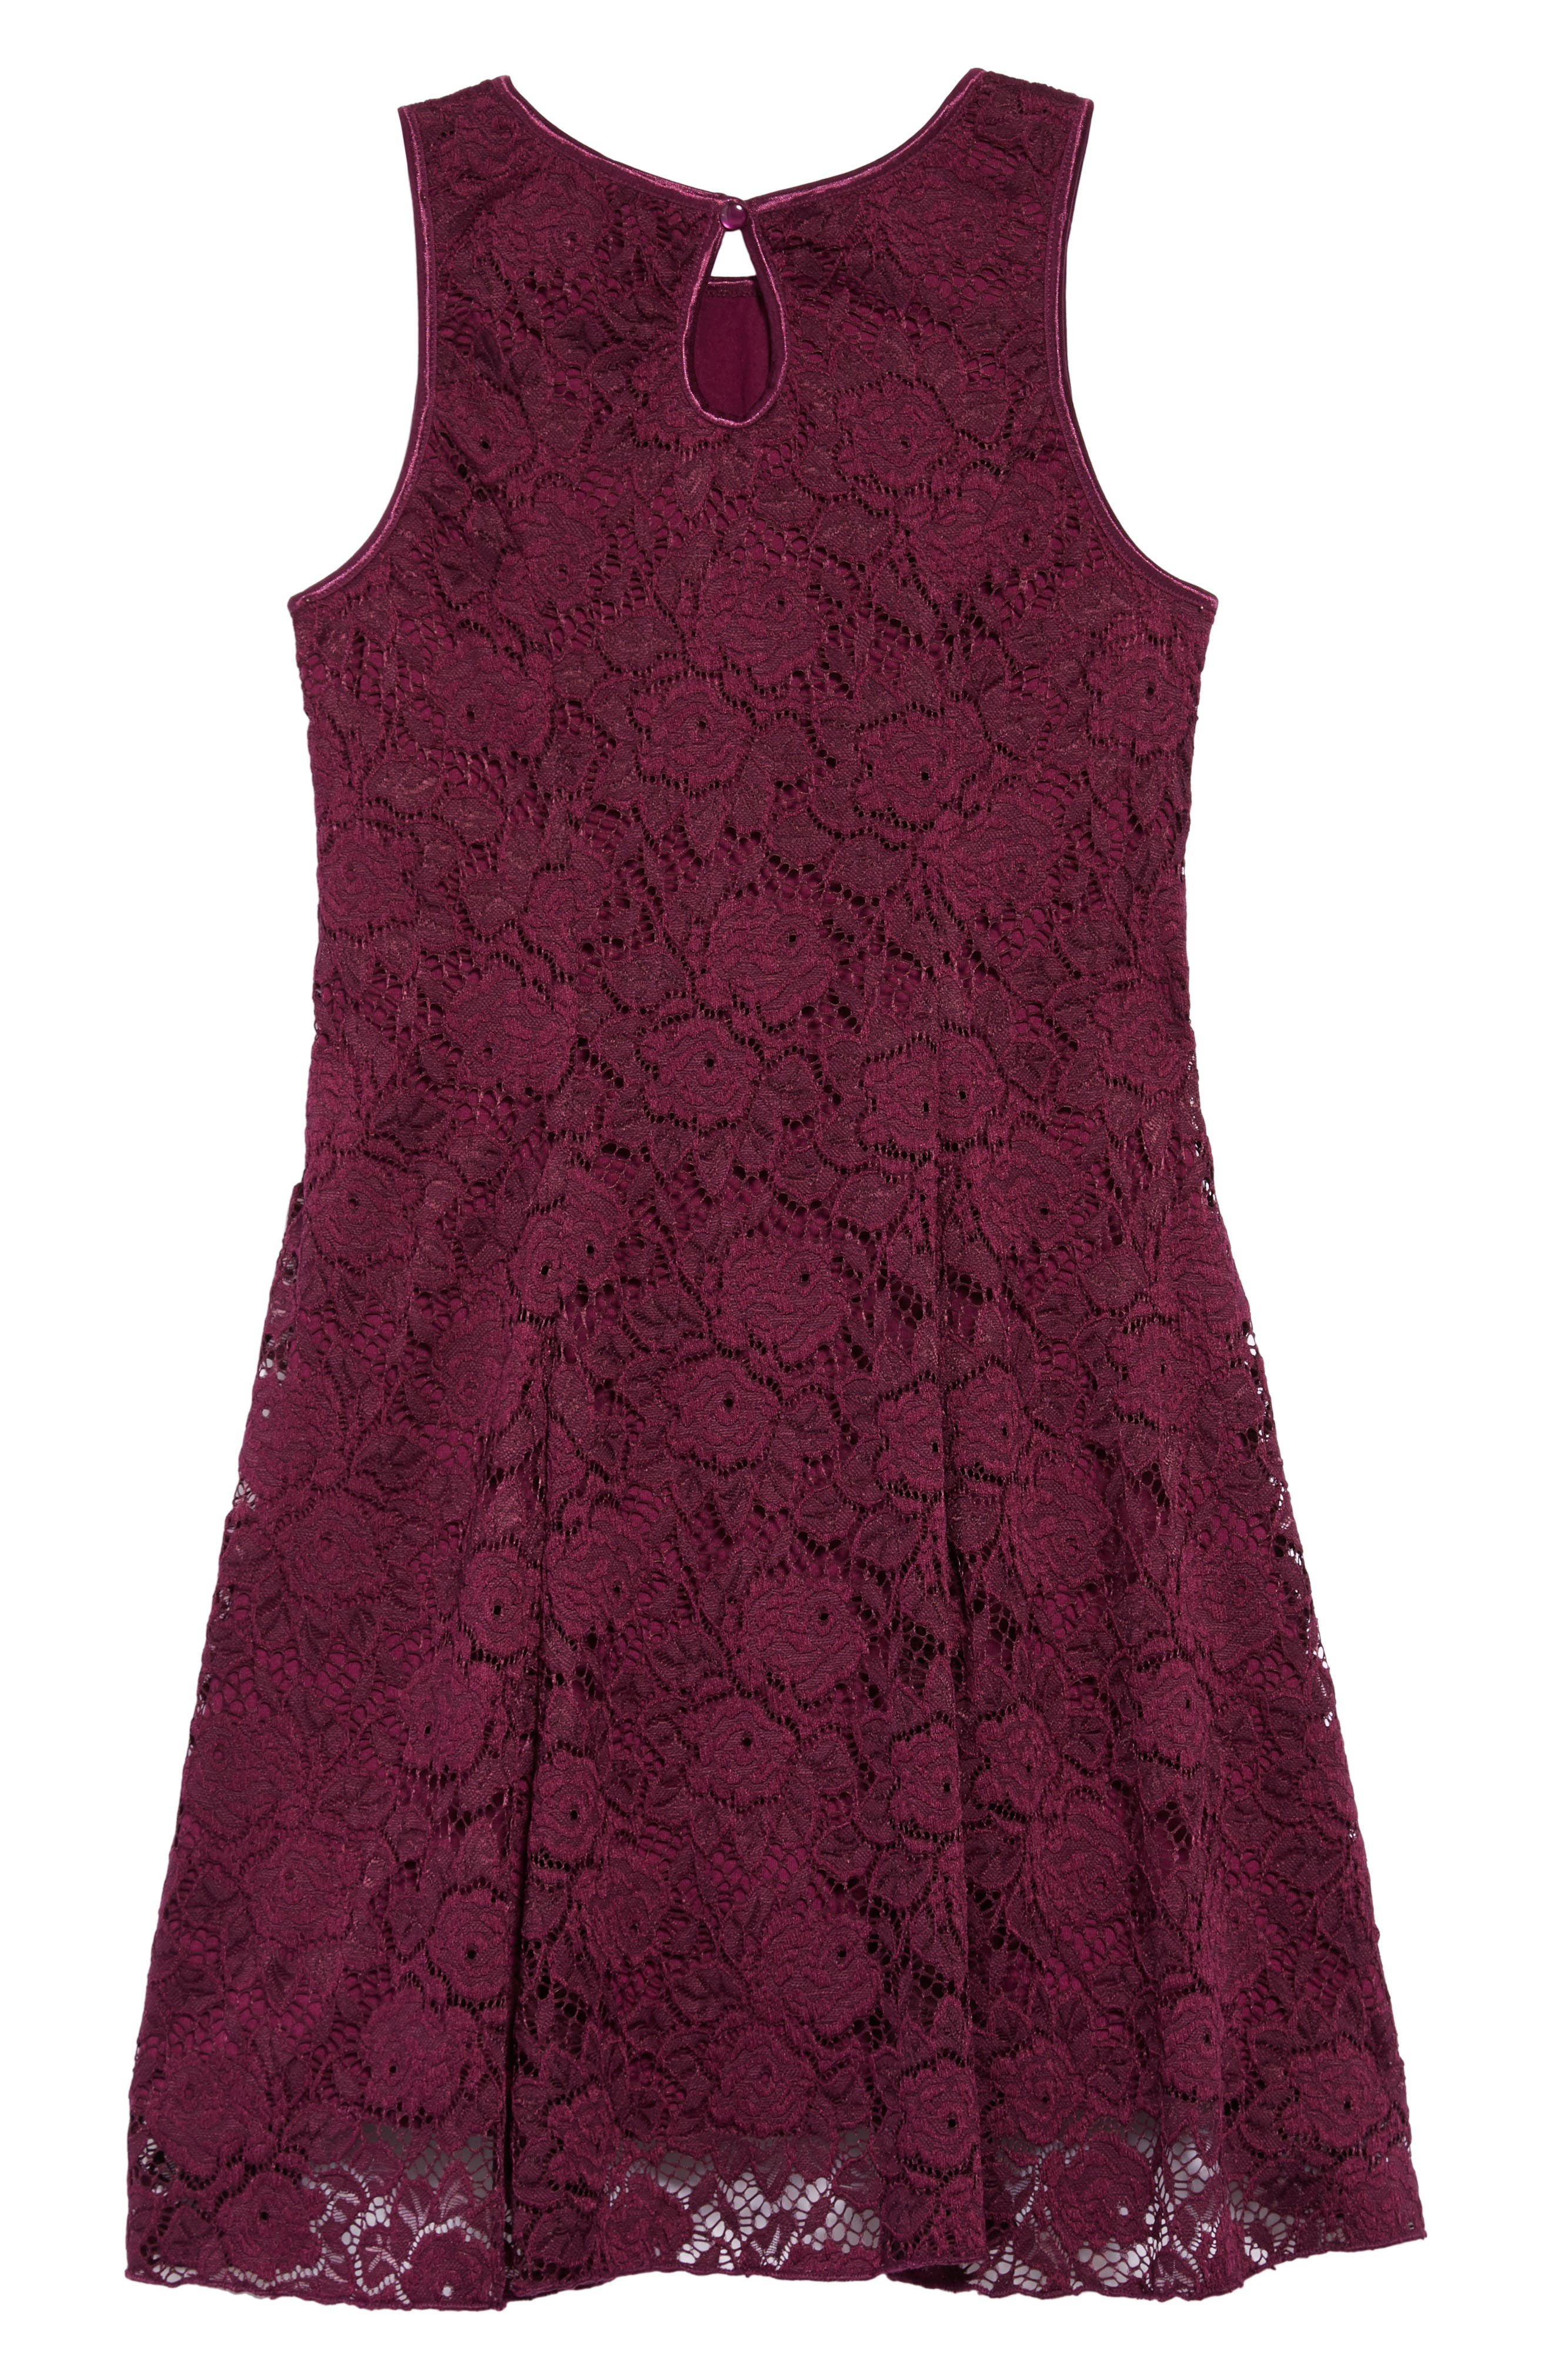 Lace Skater Dress,                             Alternate thumbnail 2, color,                             PLUM